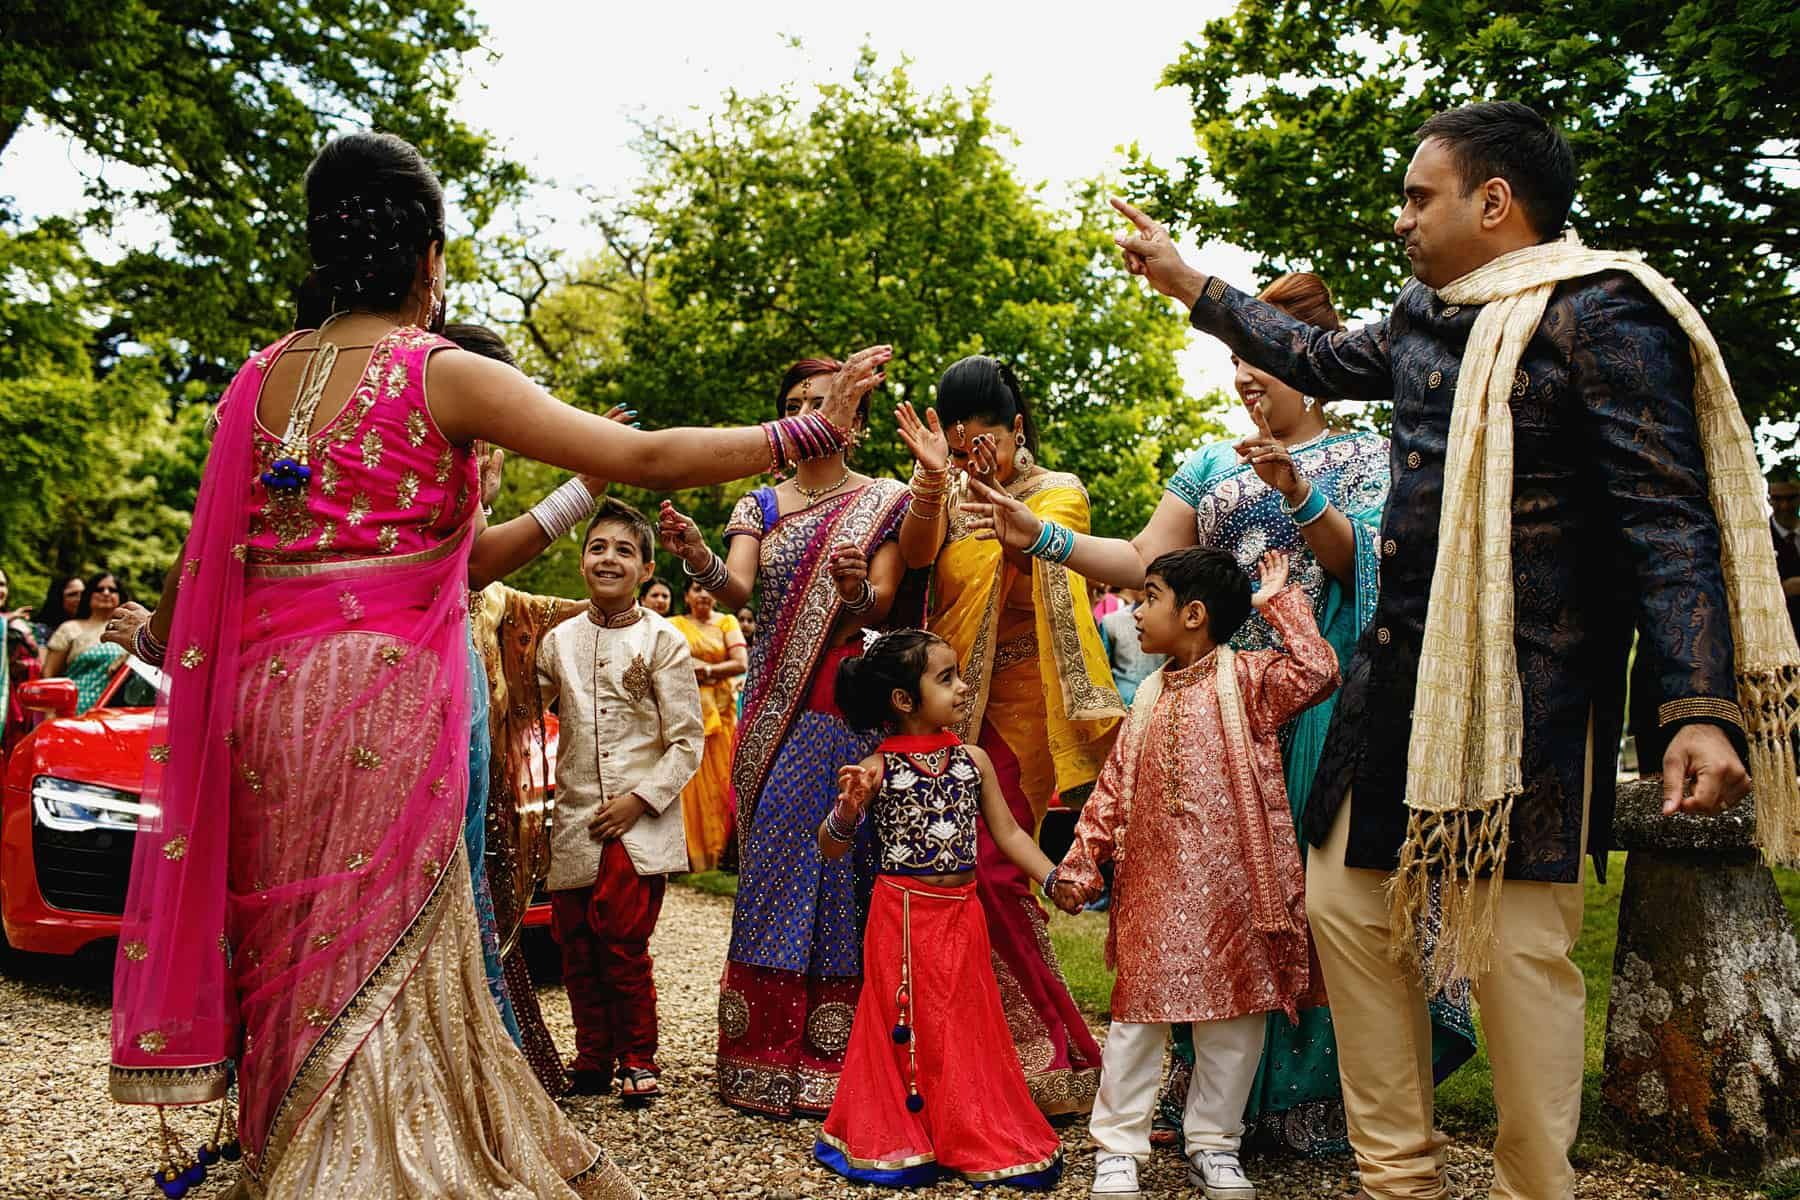 northbrook park indian wedding